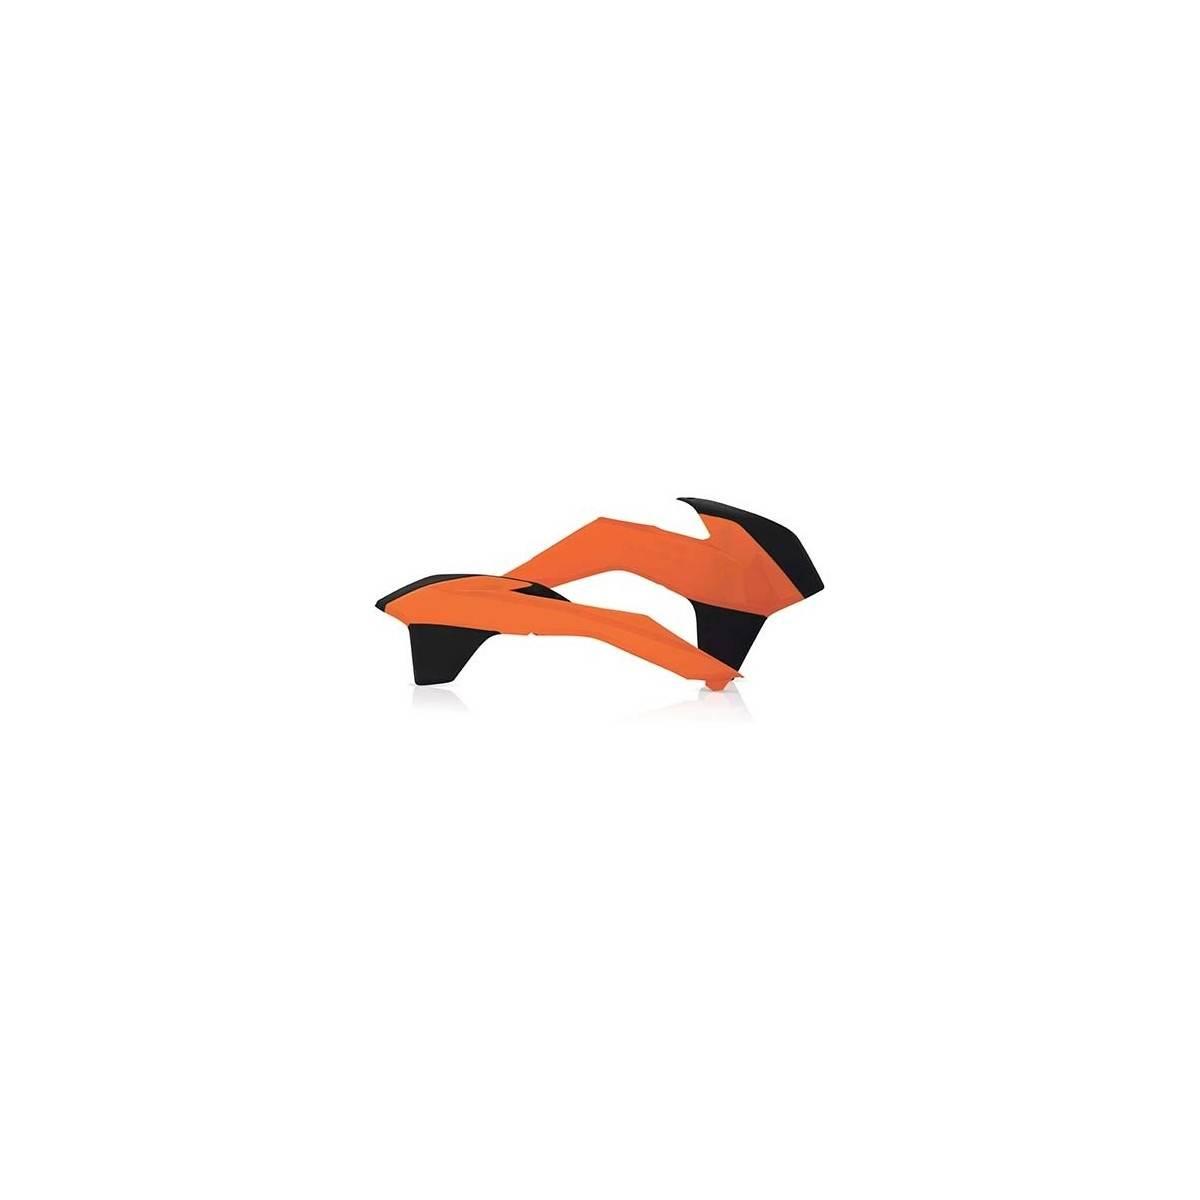 0016871-016 - Tapa Radiador Ktm 14 16 Naranja Negro